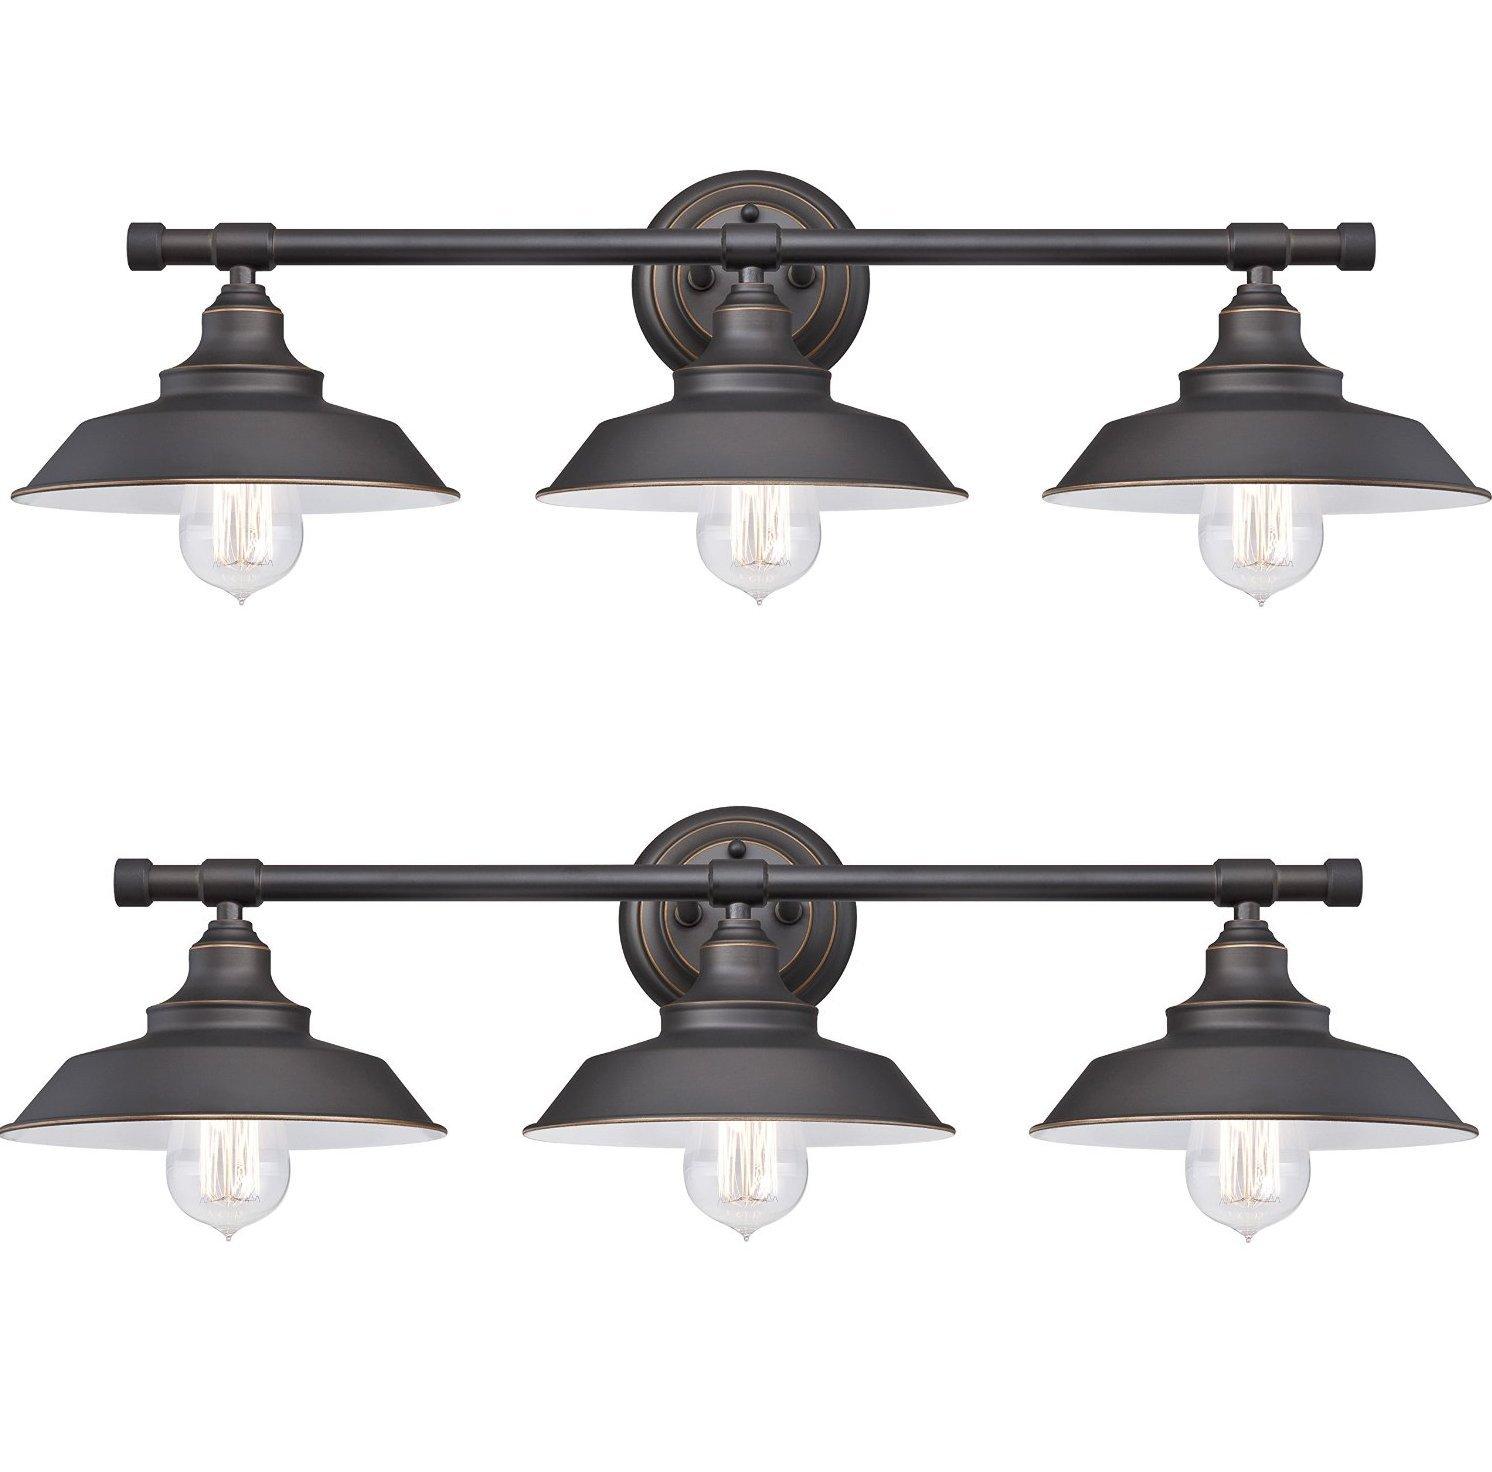 Westinghouse Iron Hill 屋内壁付け3灯照明器具 Pack of 2 6343400 B01KU8UH72